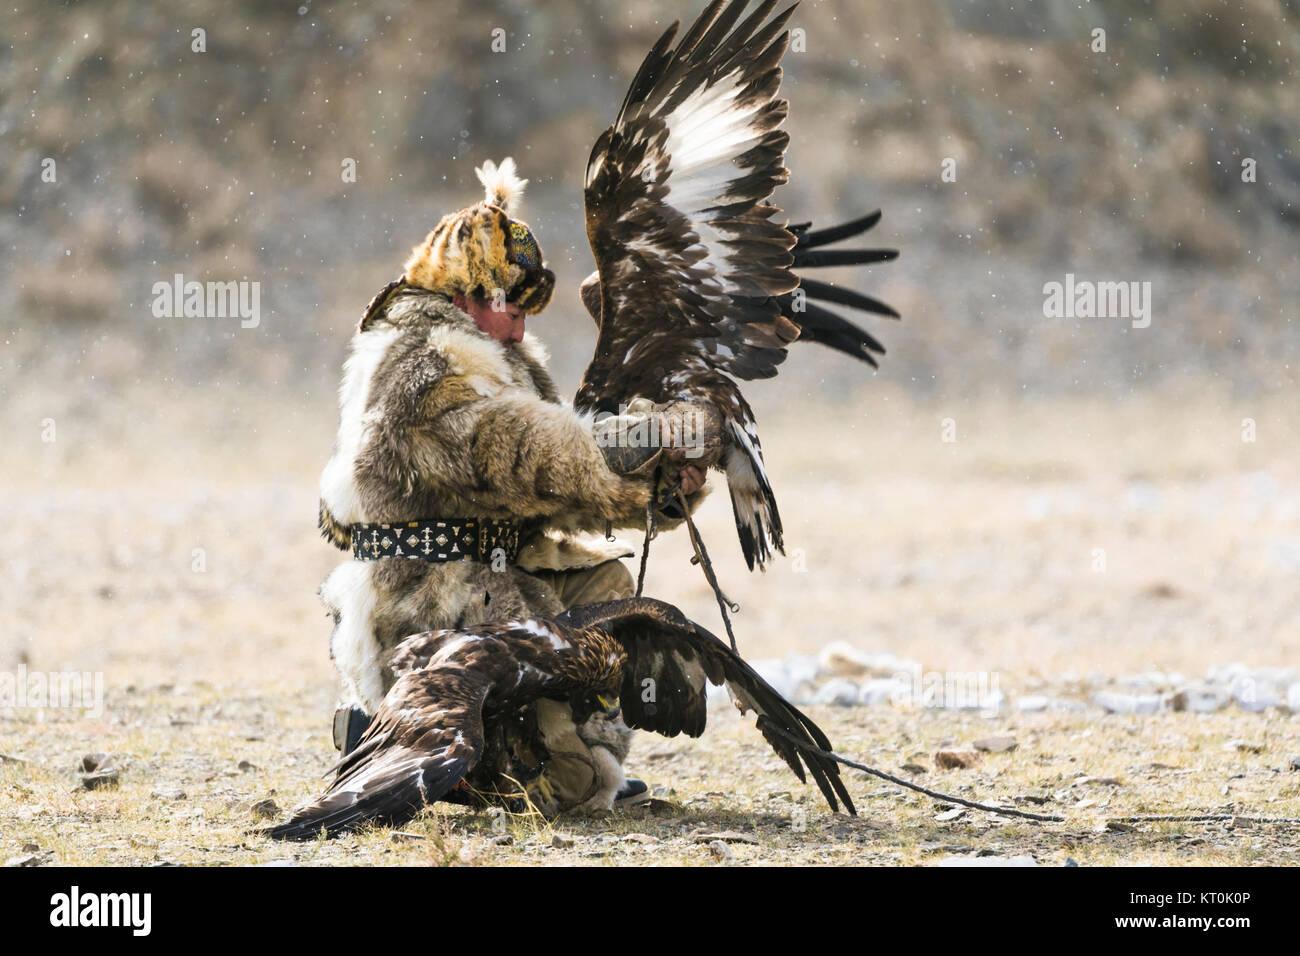 Kazakh eagle hunter with eagles - Stock Image